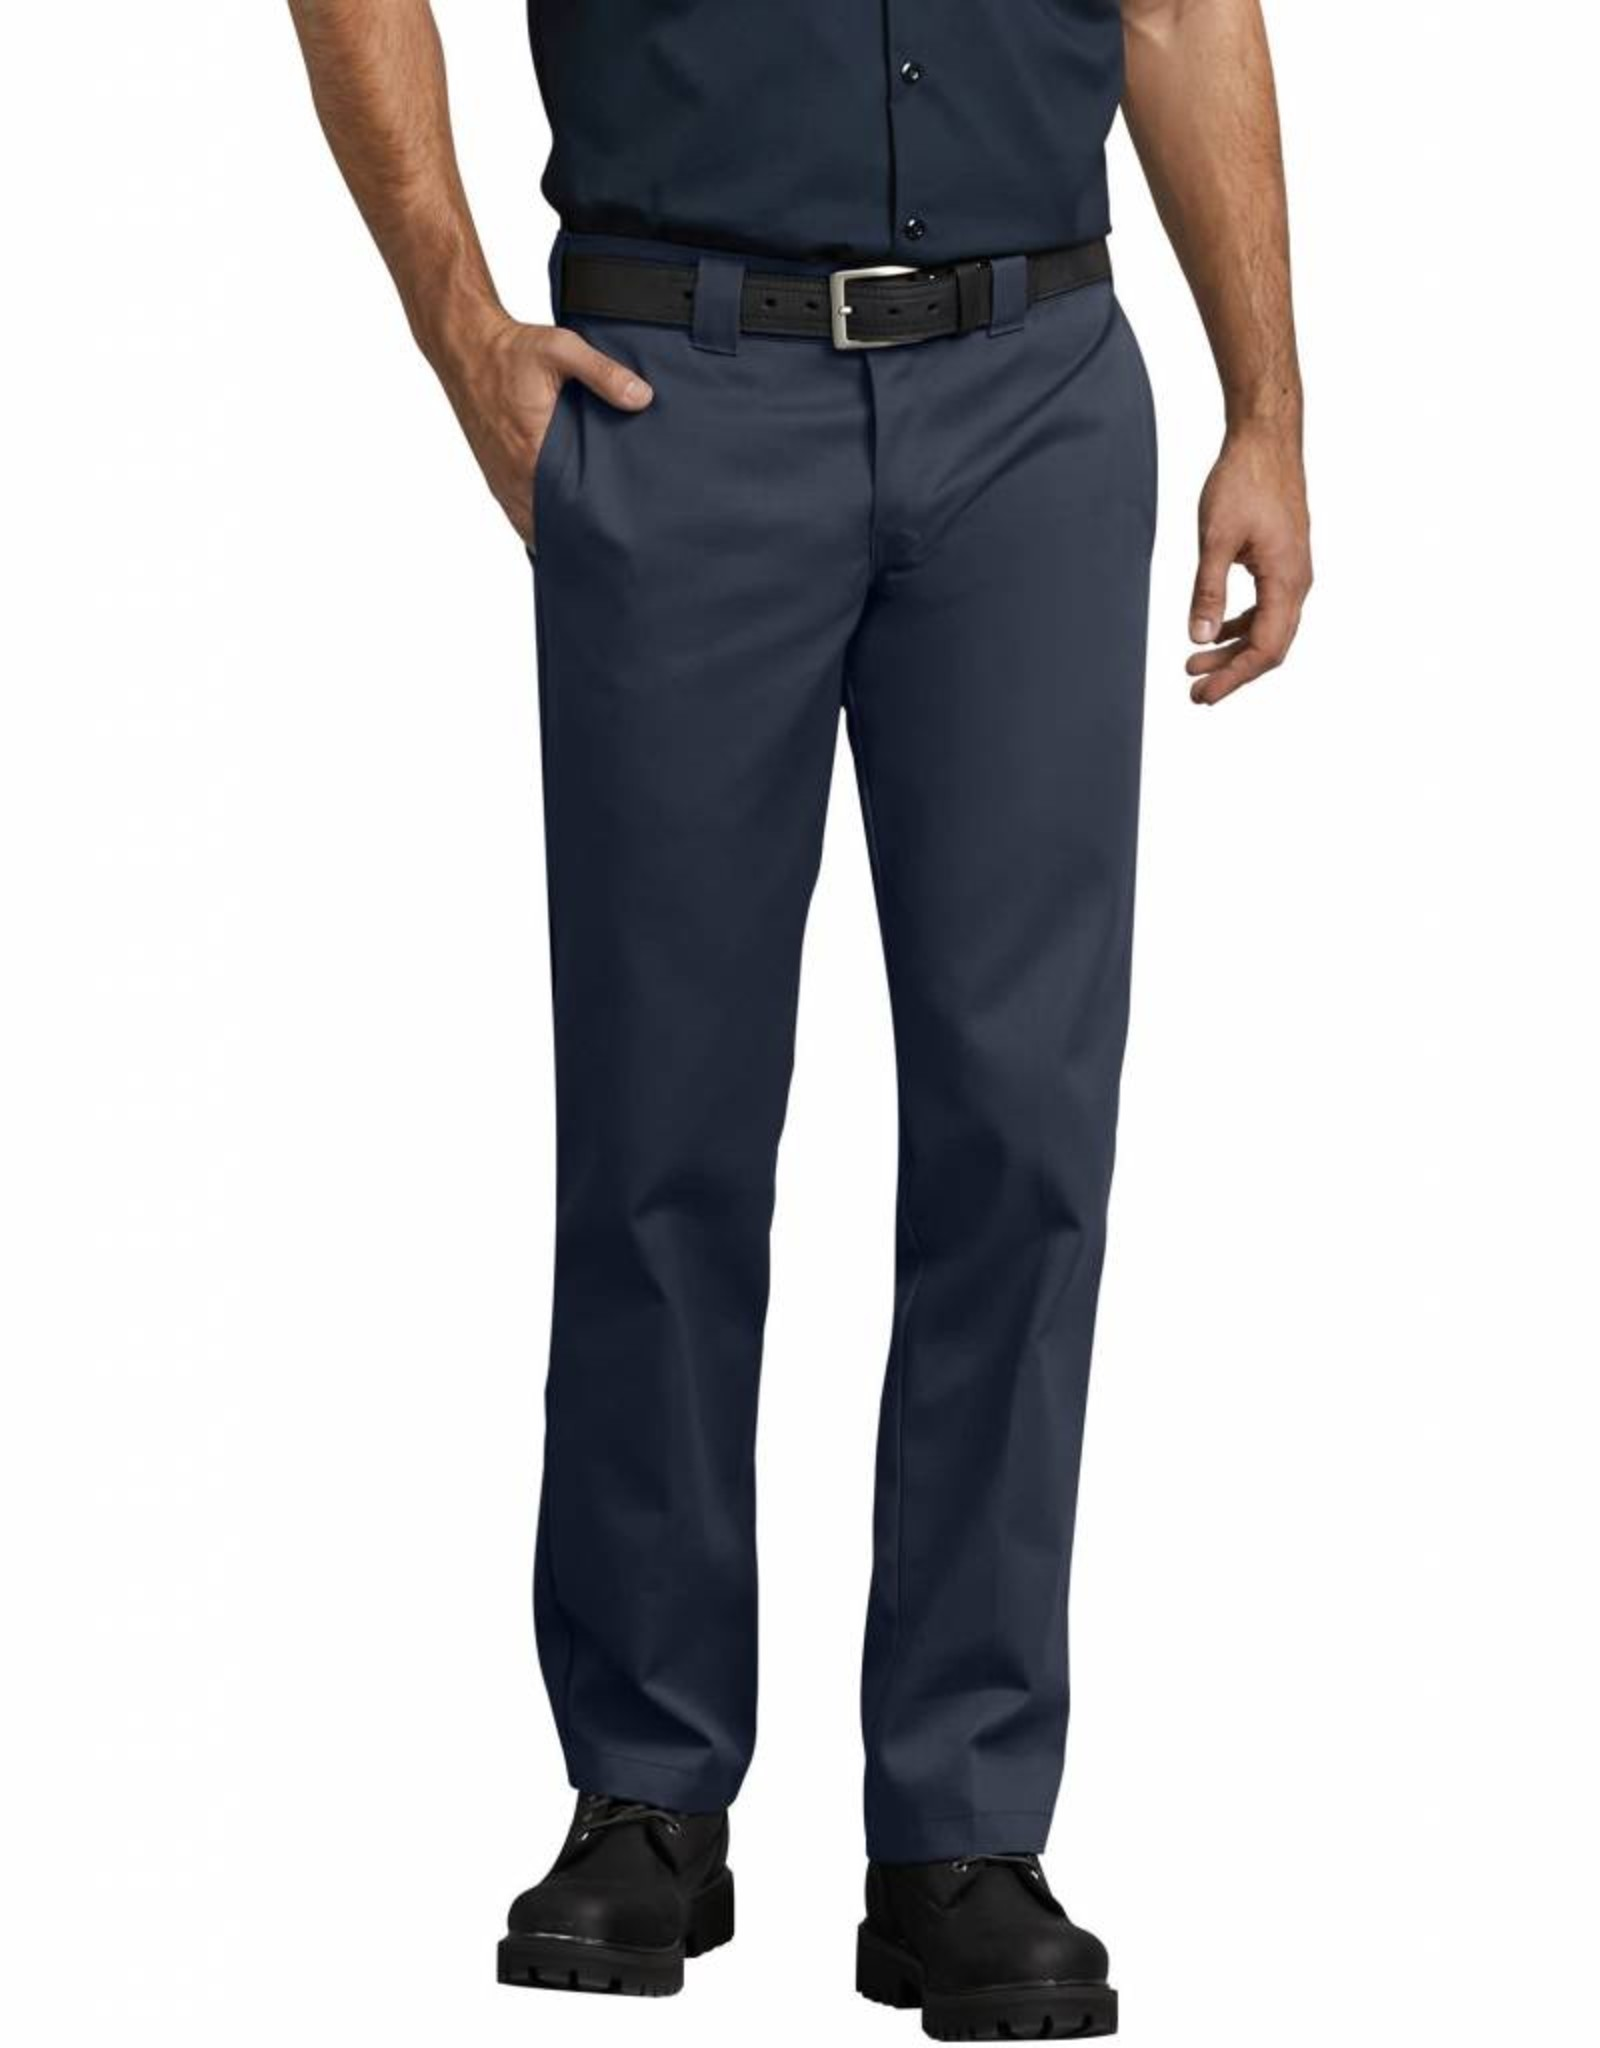 DICKIES Slim Fit Straight Leg Work Pant WP873